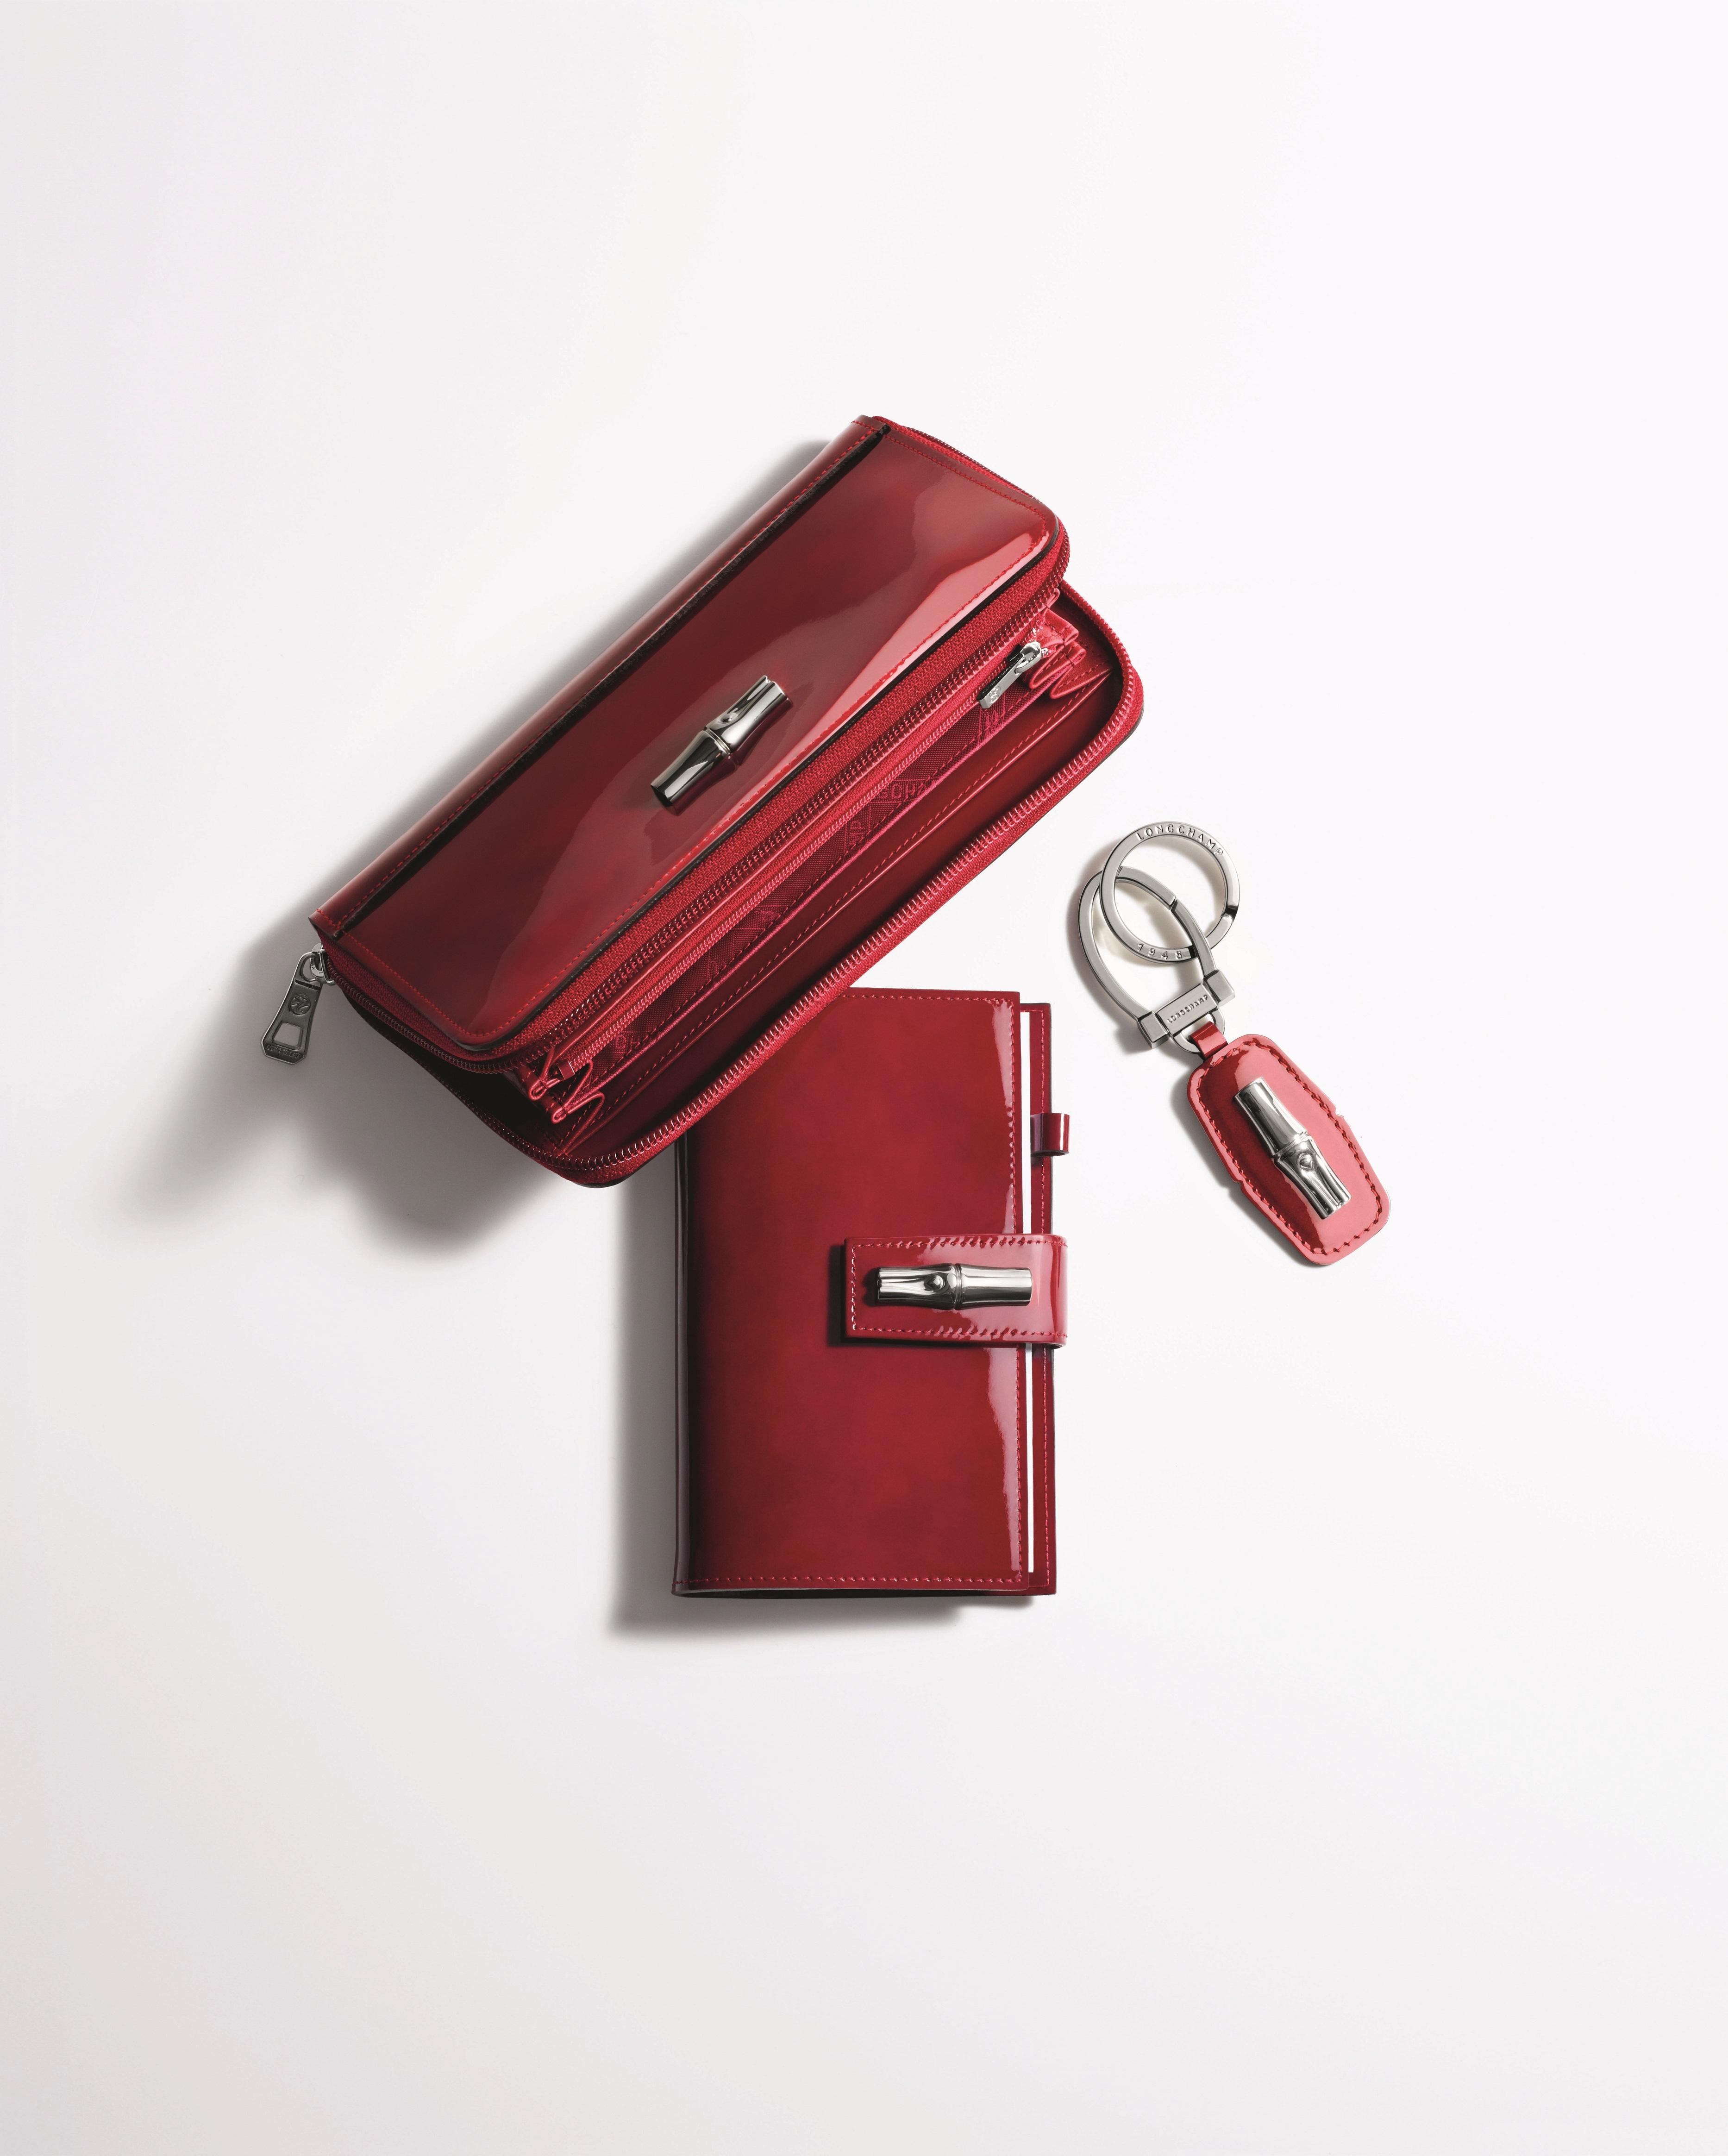 e035060cb8f9 Noël 2014   petits cadeaux tout en cuir par Longchamp - Terrafemina